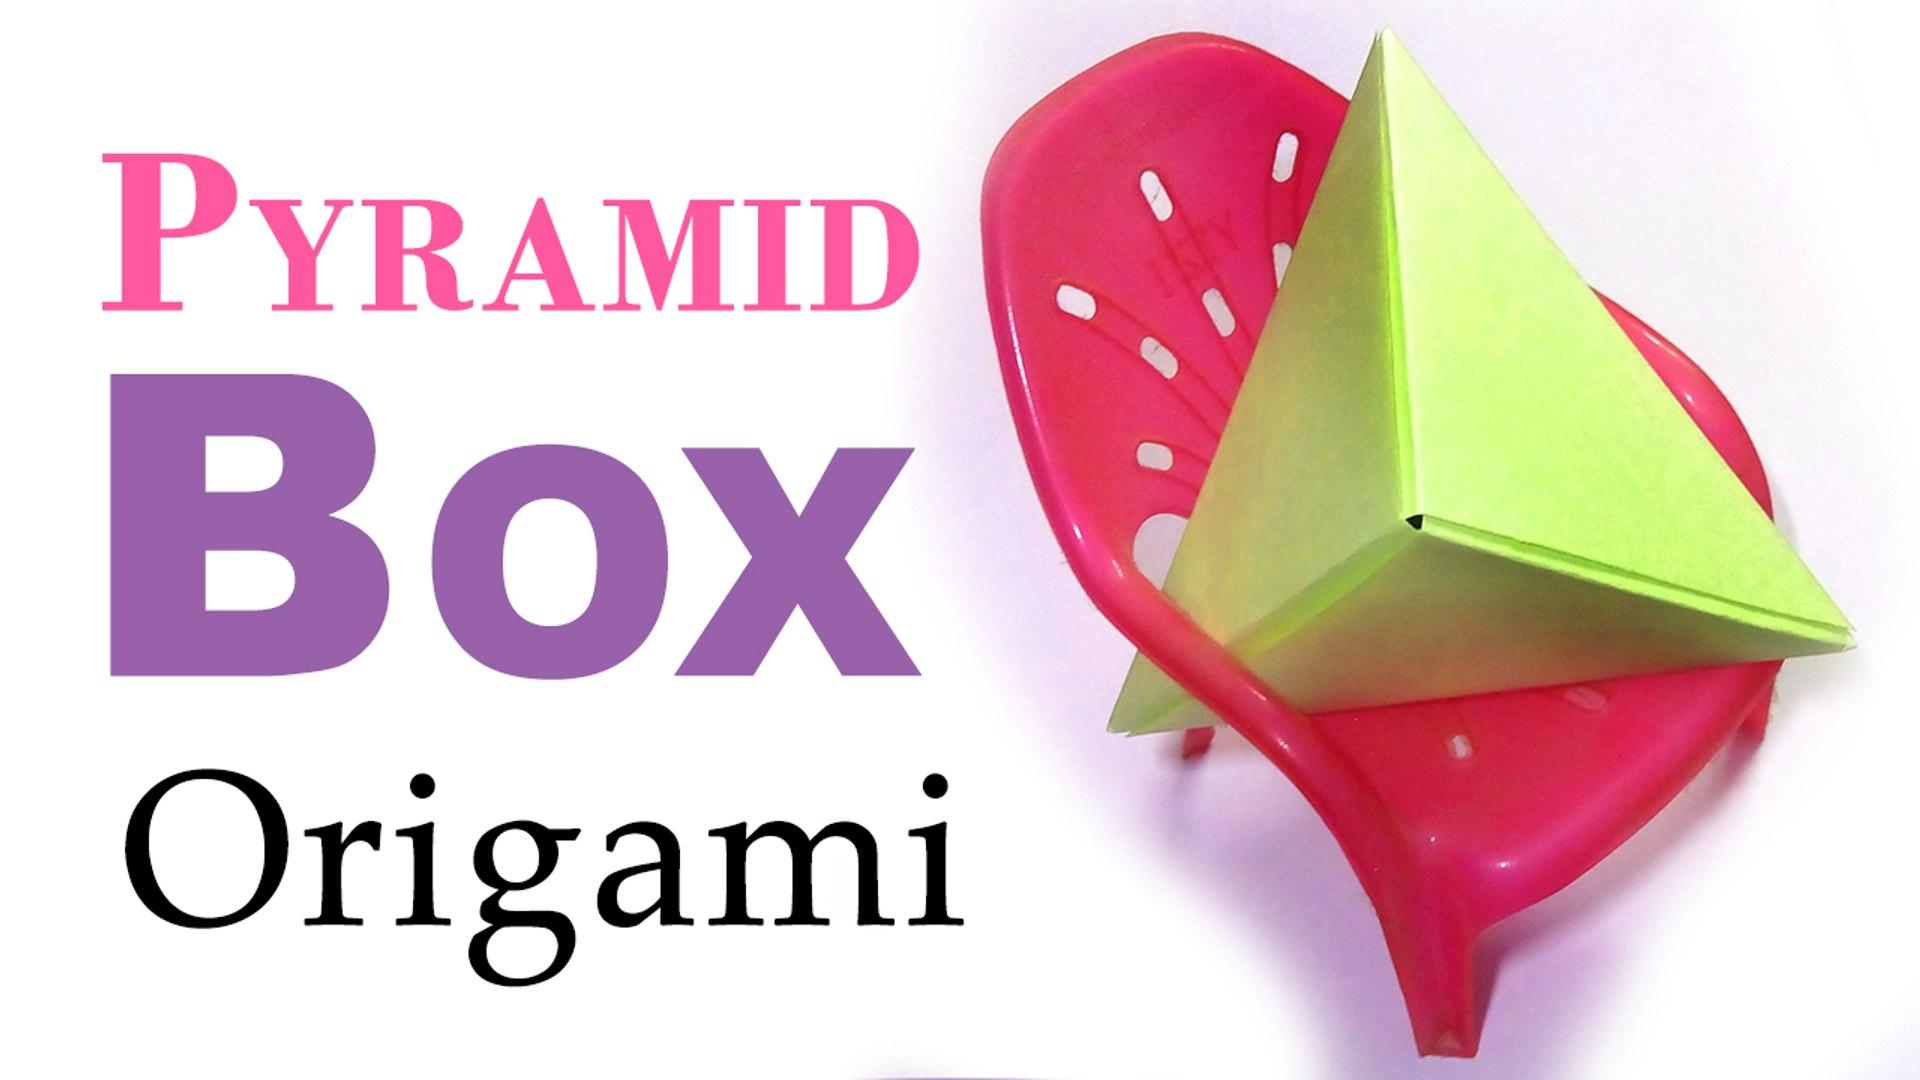 Origami Pyramid Pixels for 3D Paper Wall Art | Origami wall art ... | 1080x1920